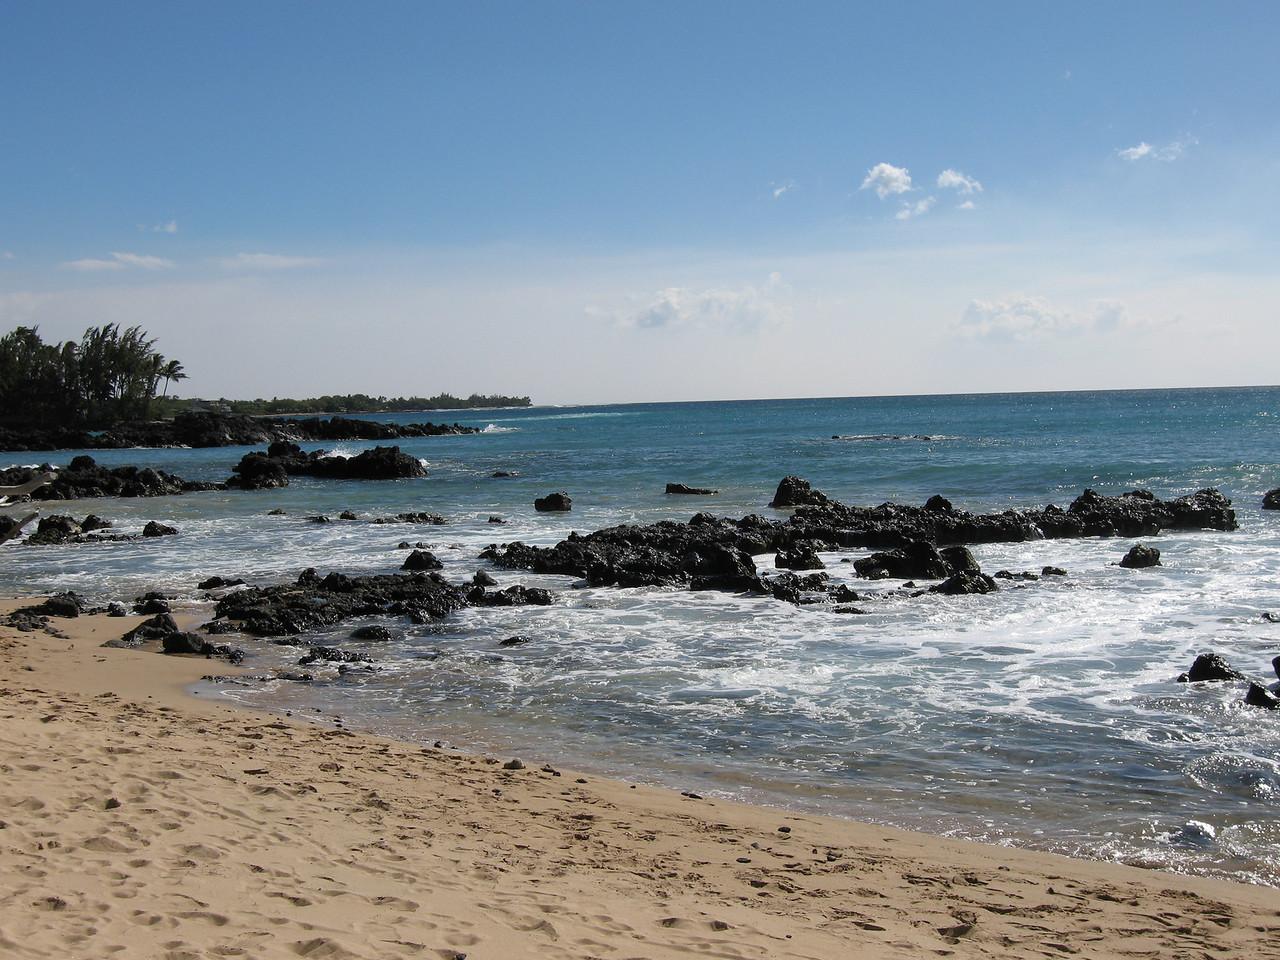 Pauako Beach on Day 6, Saturday.